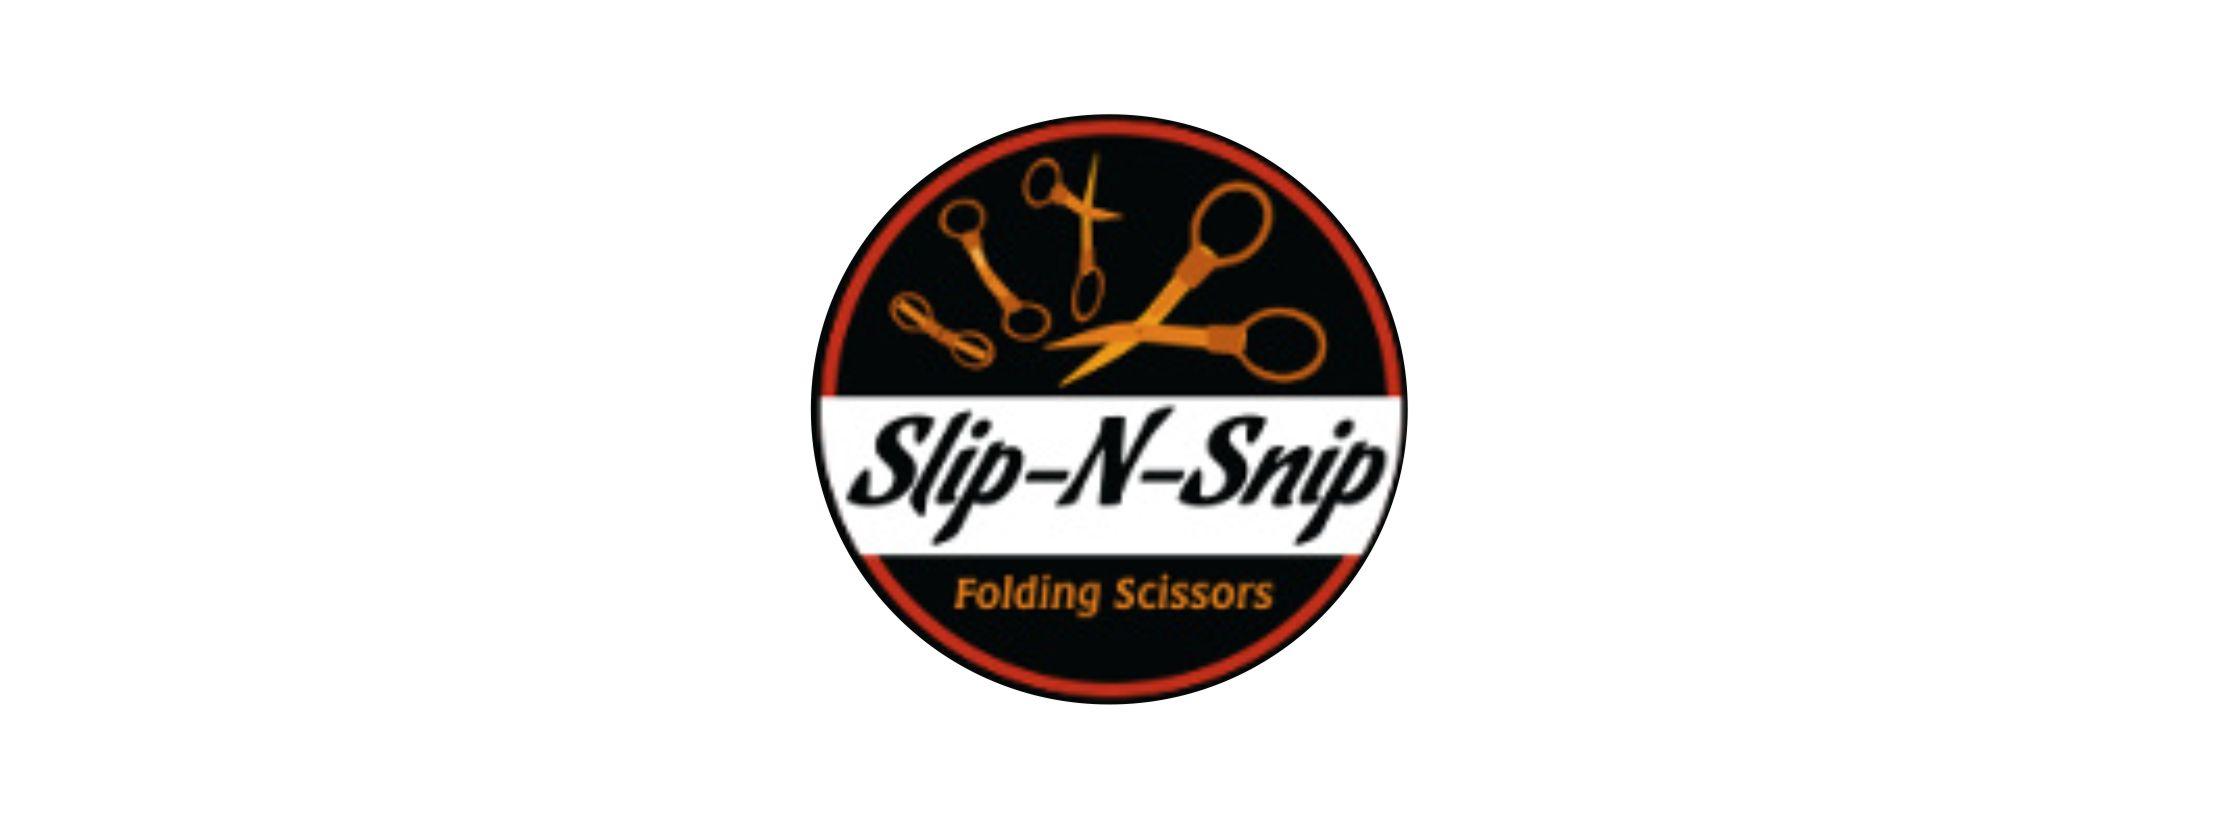 Slip-N-Snip Folding Scissor